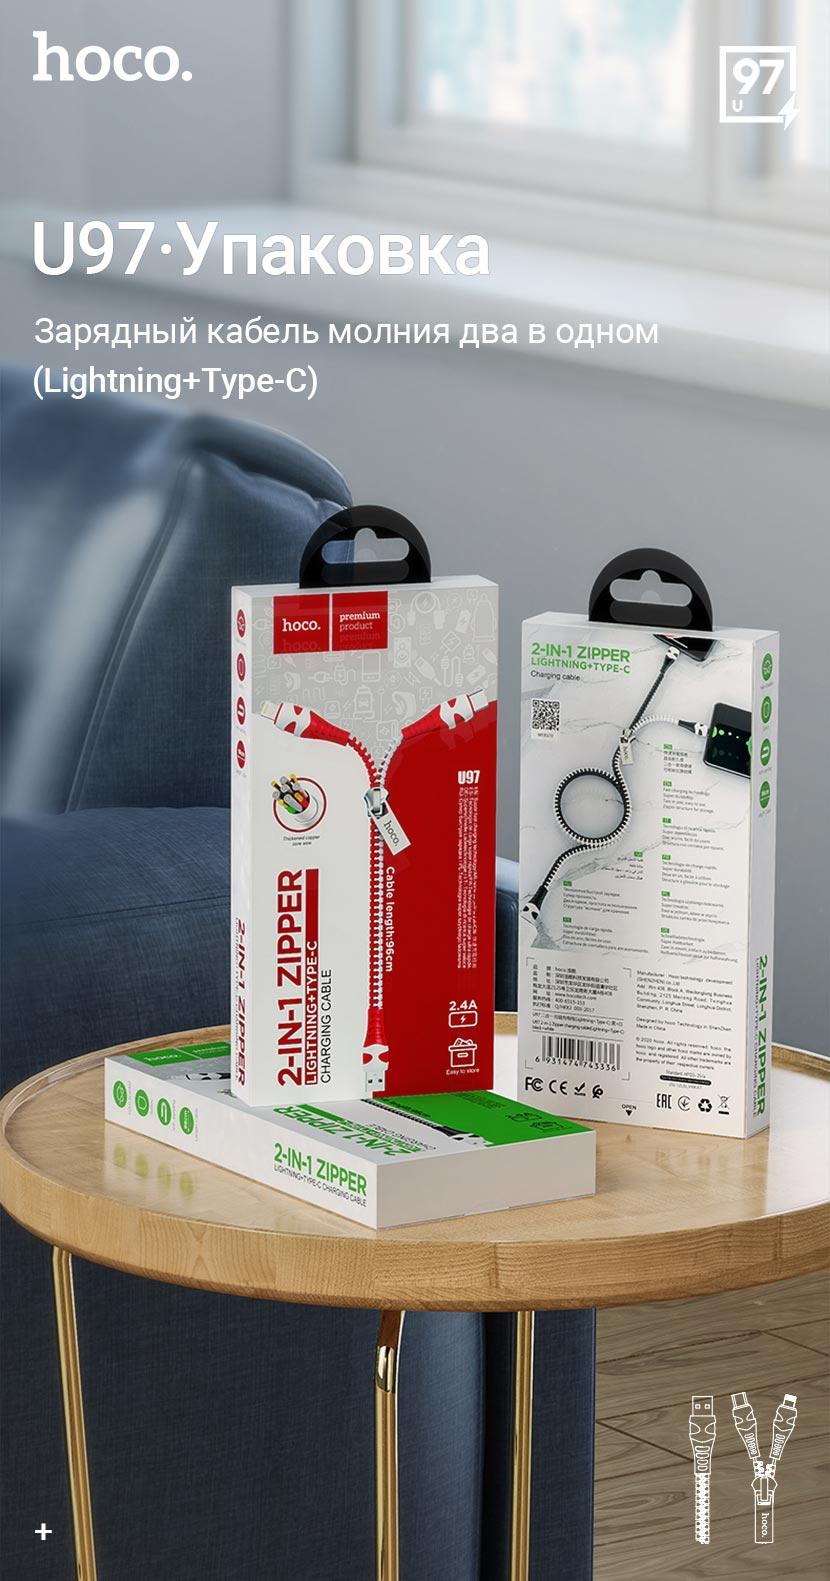 hoco news u97 2in1 zipper charging cable lightning type c package ru